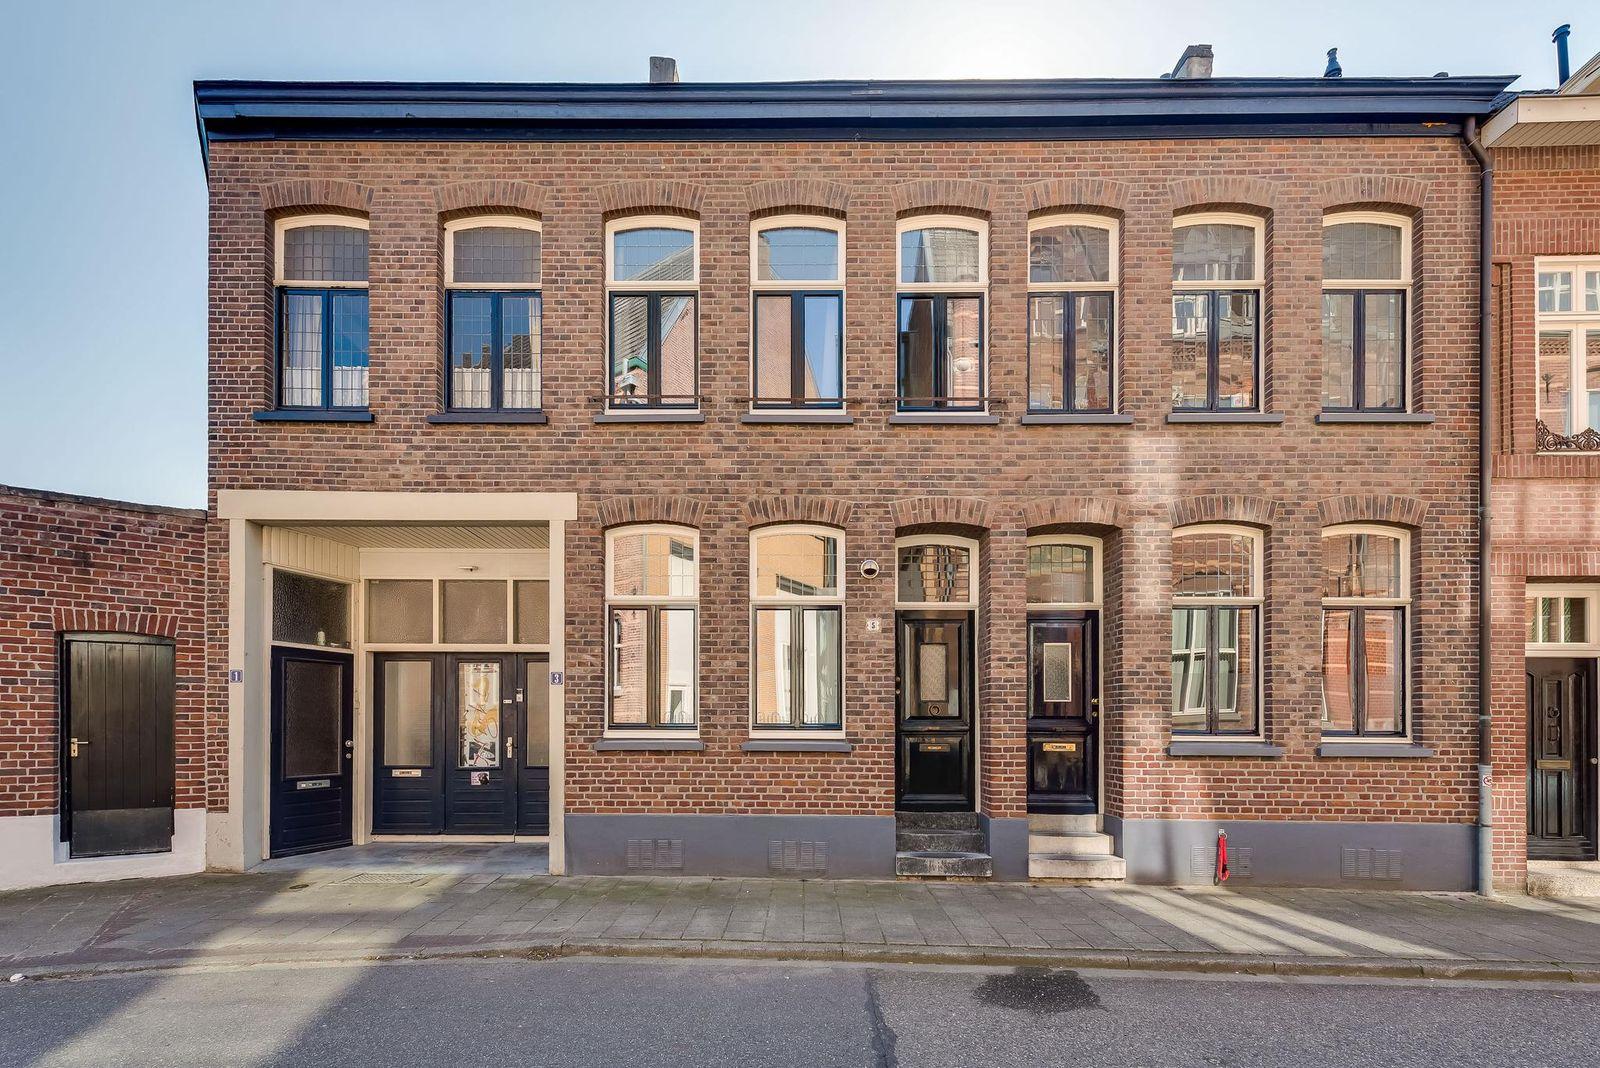 Godsweerderstraat 5, Roermond